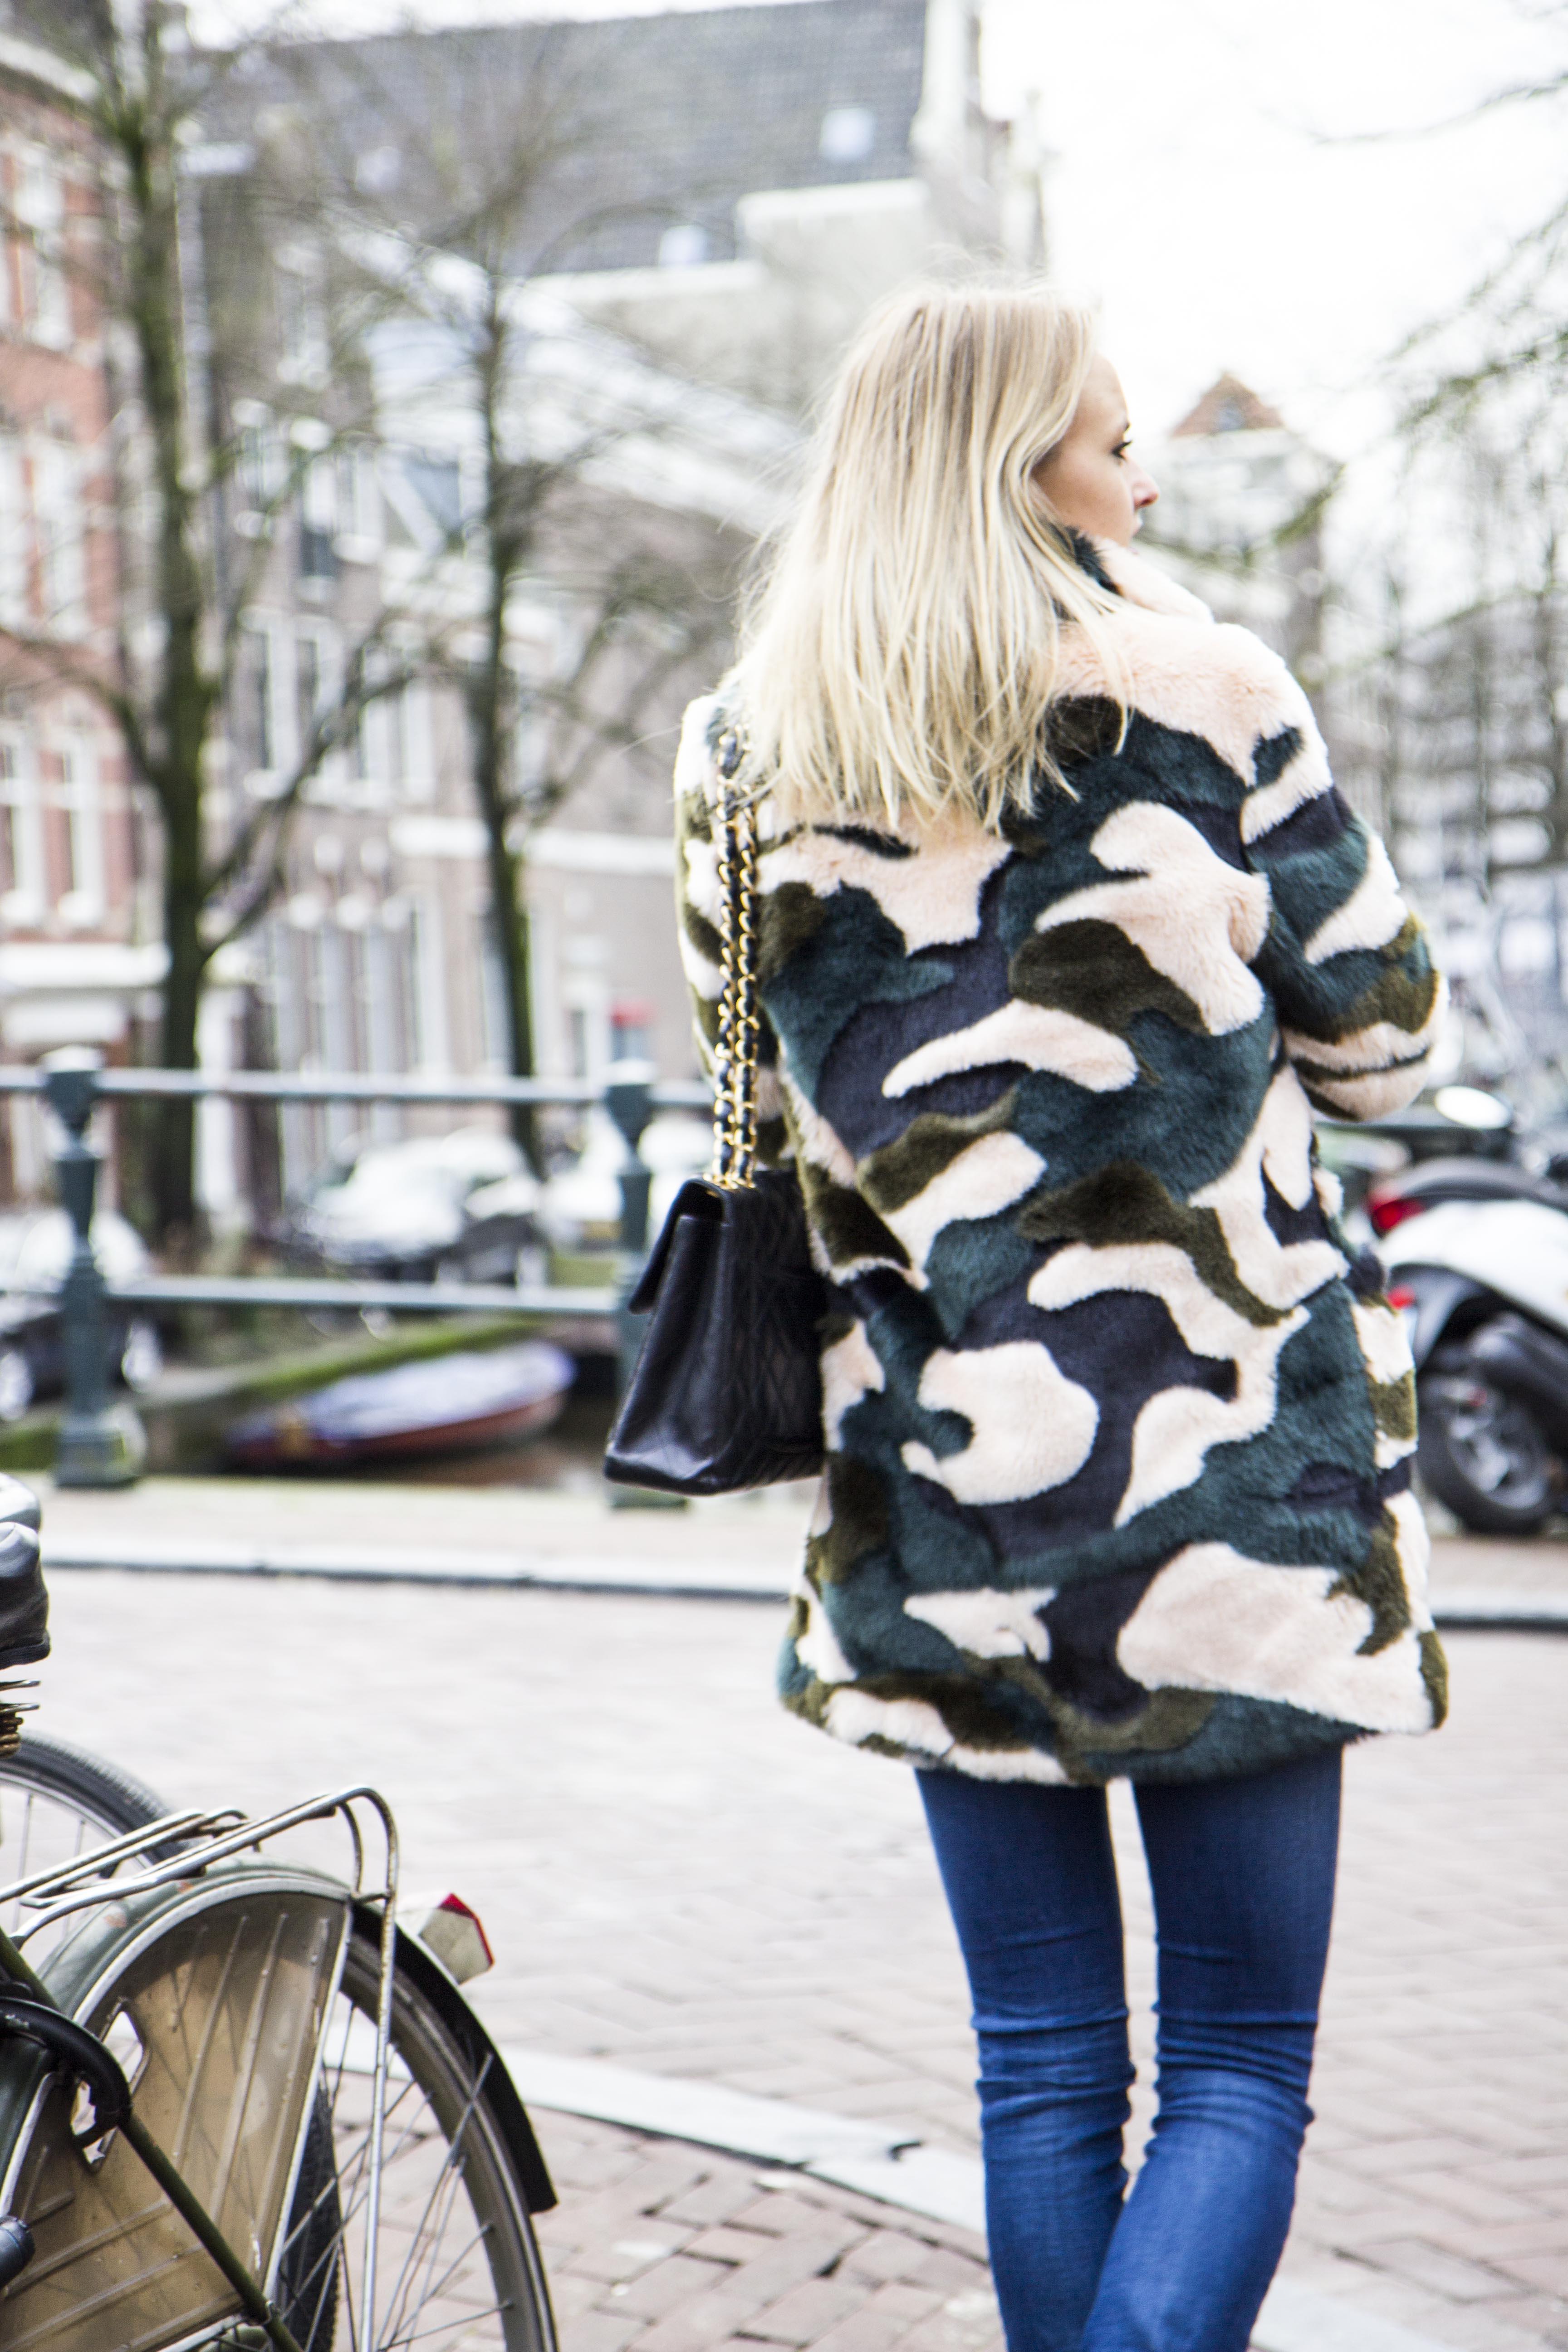 Bag at You - Chanel - Walk away